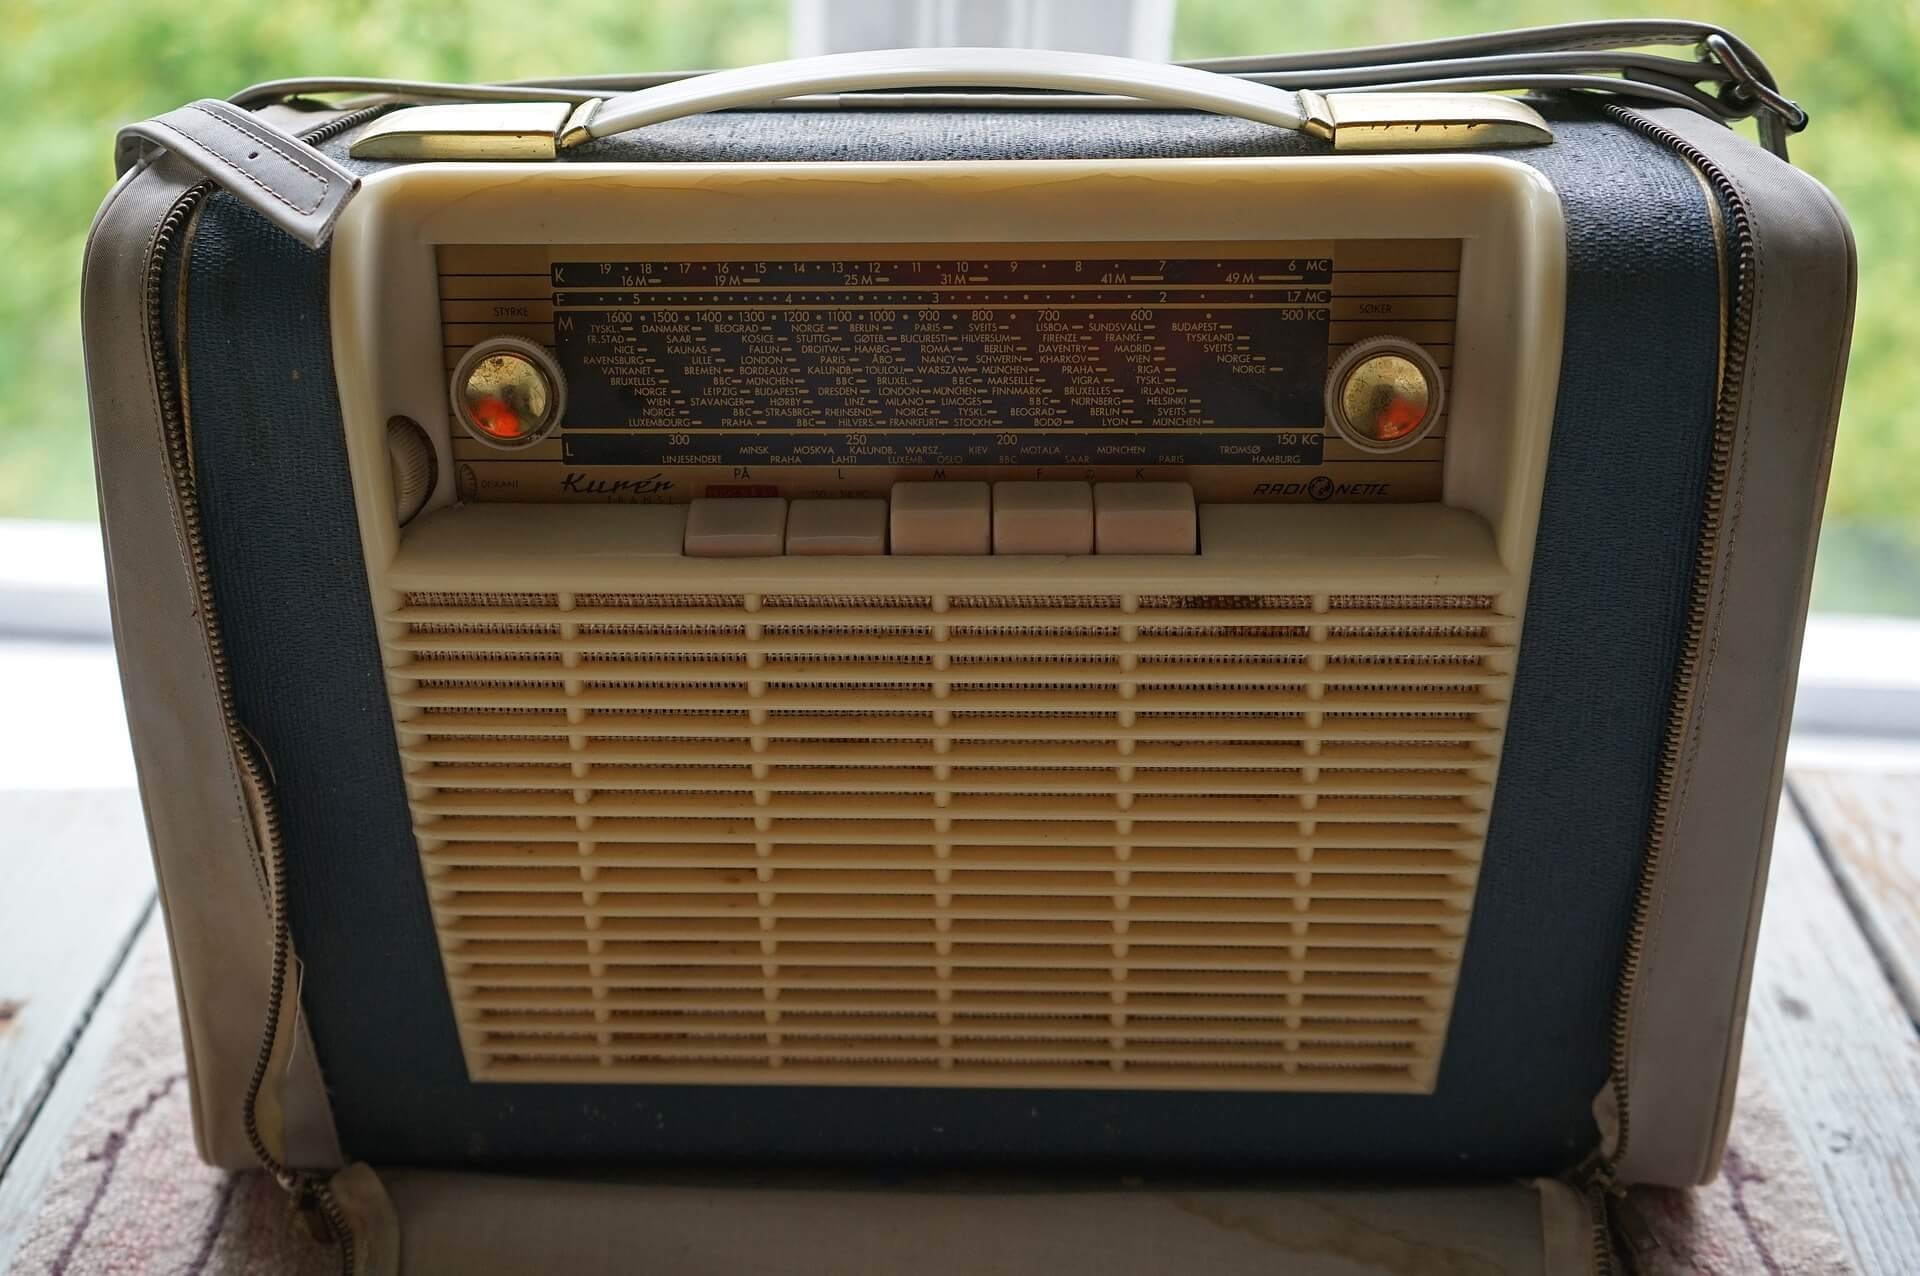 Musik aus dem Radio für gute Laune (c) barni1 / pixabay.de